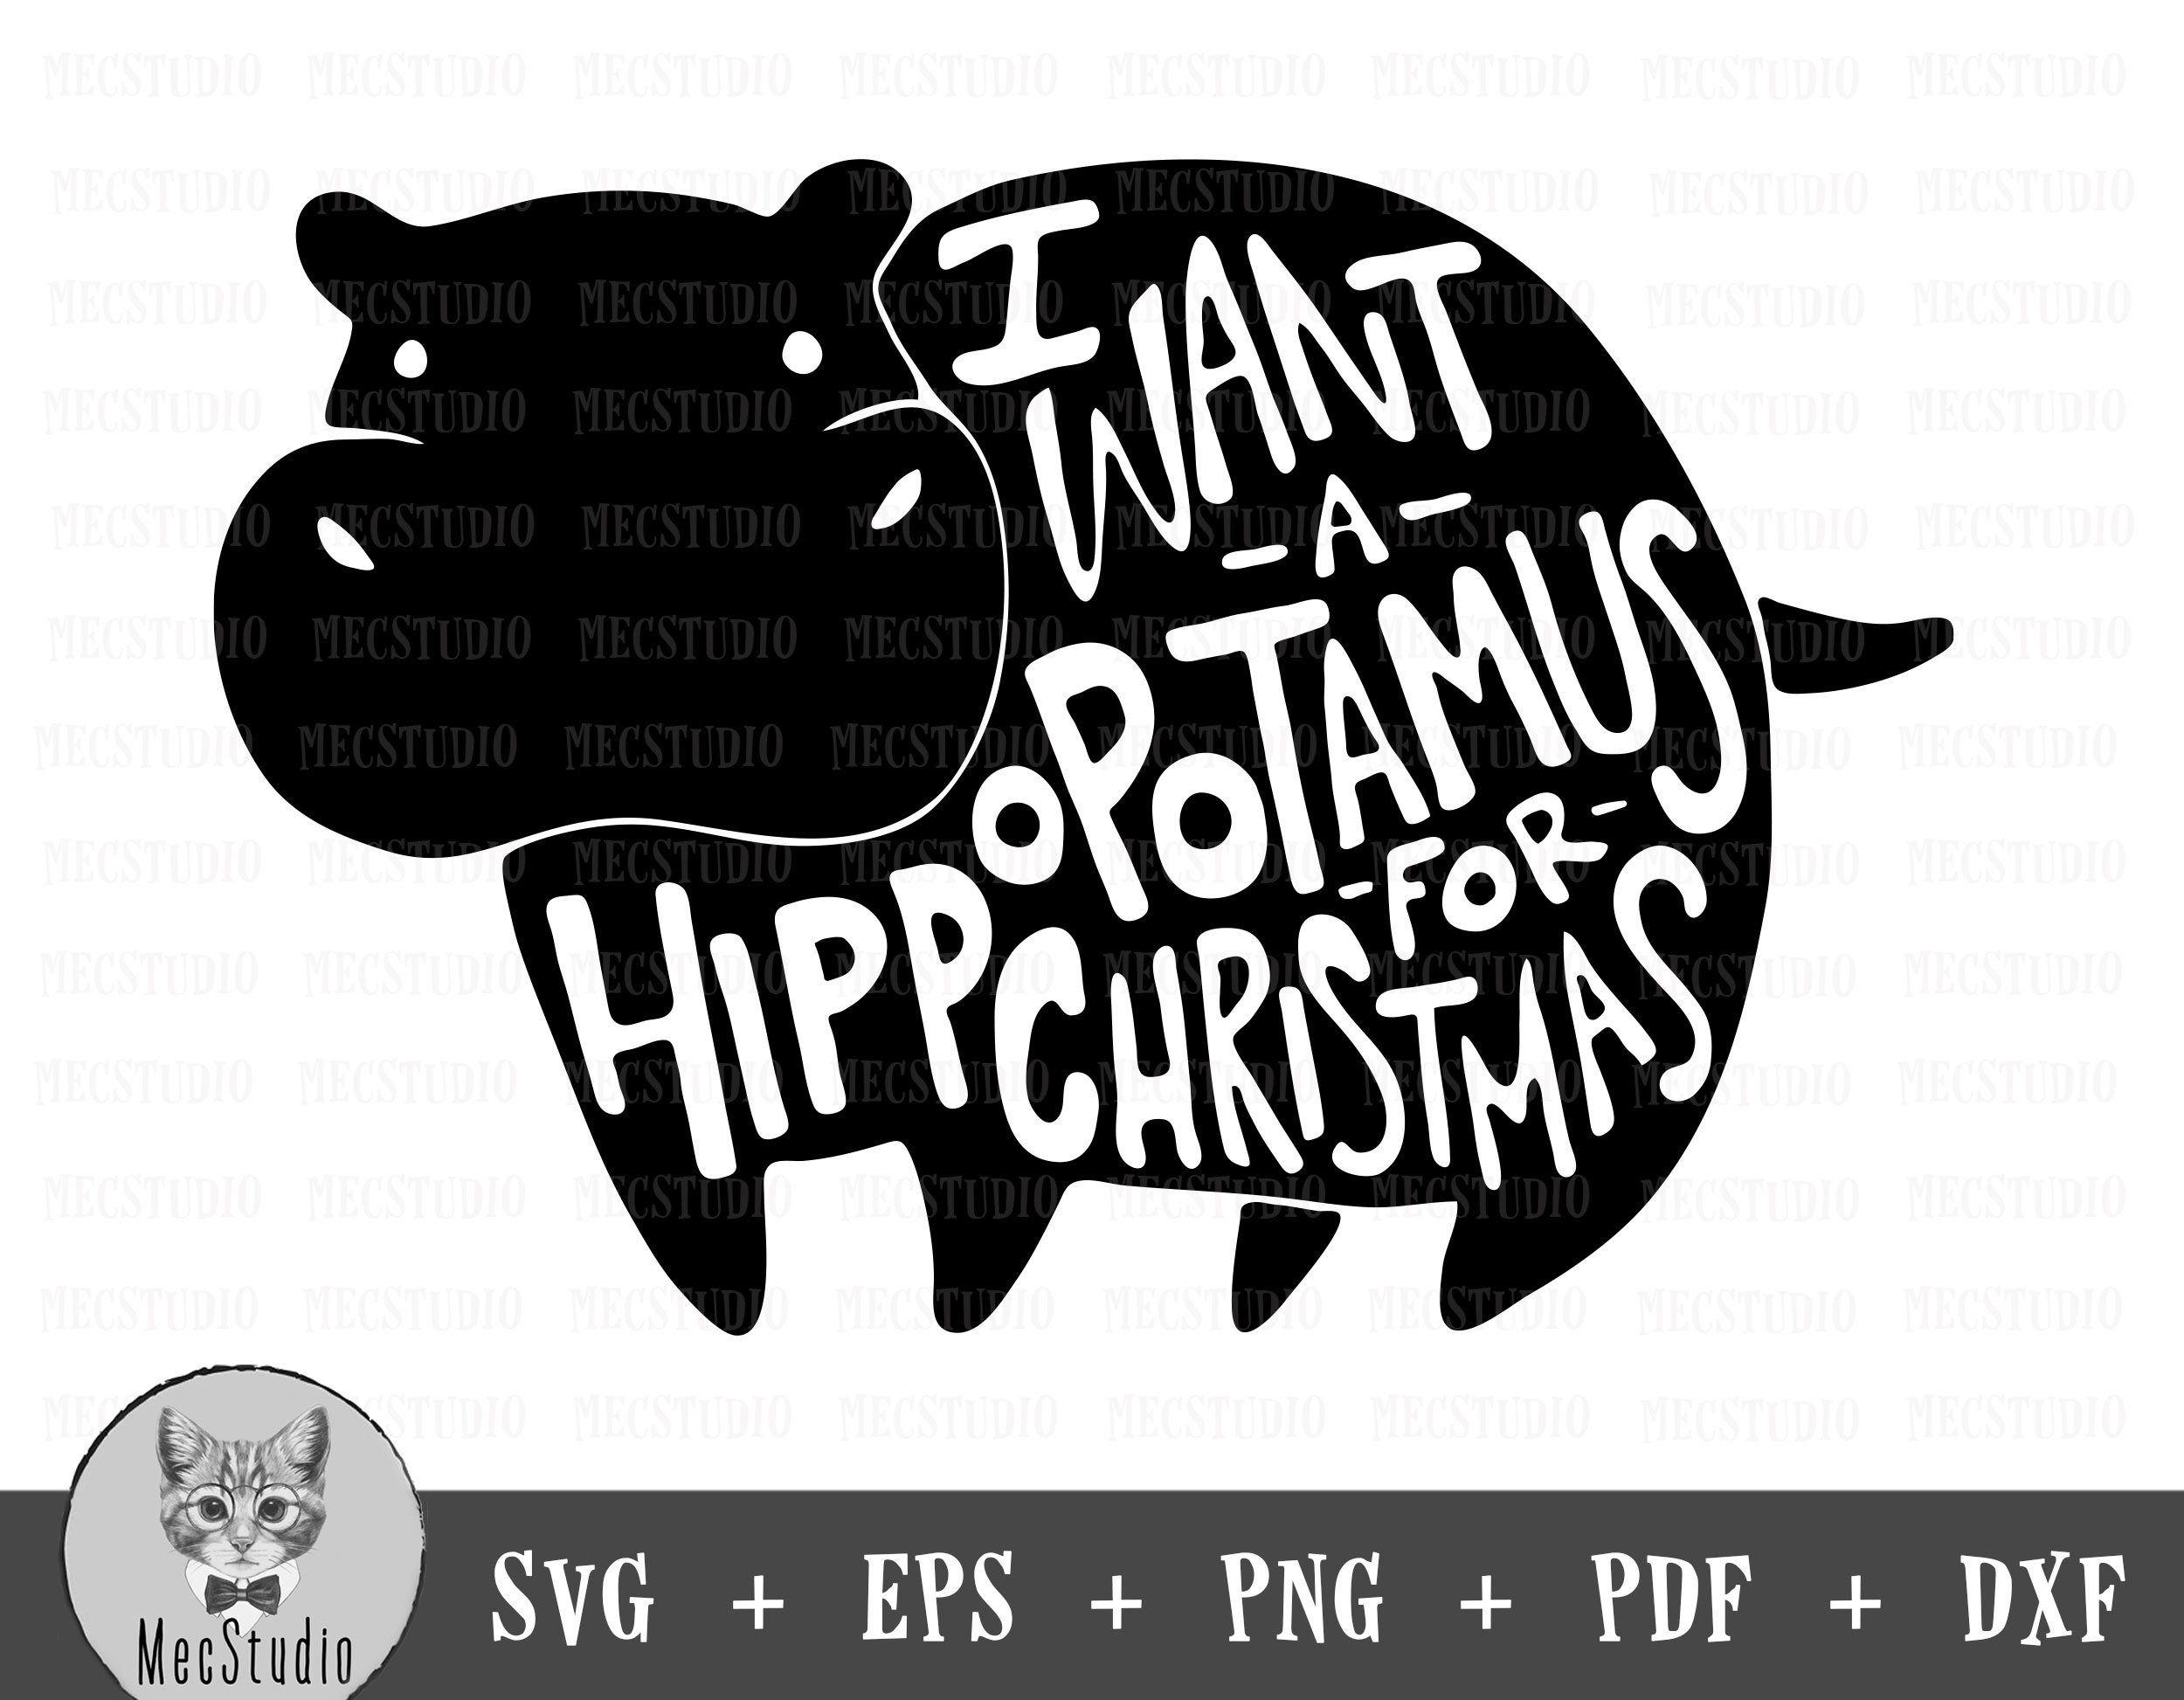 I Want A Hippopotamus For Christmas Svg Hippopotamus Christmas Svg Christmas Svg Png Christmas Christmas Svg Hippopotamus For Christmas Christmas Svg Files